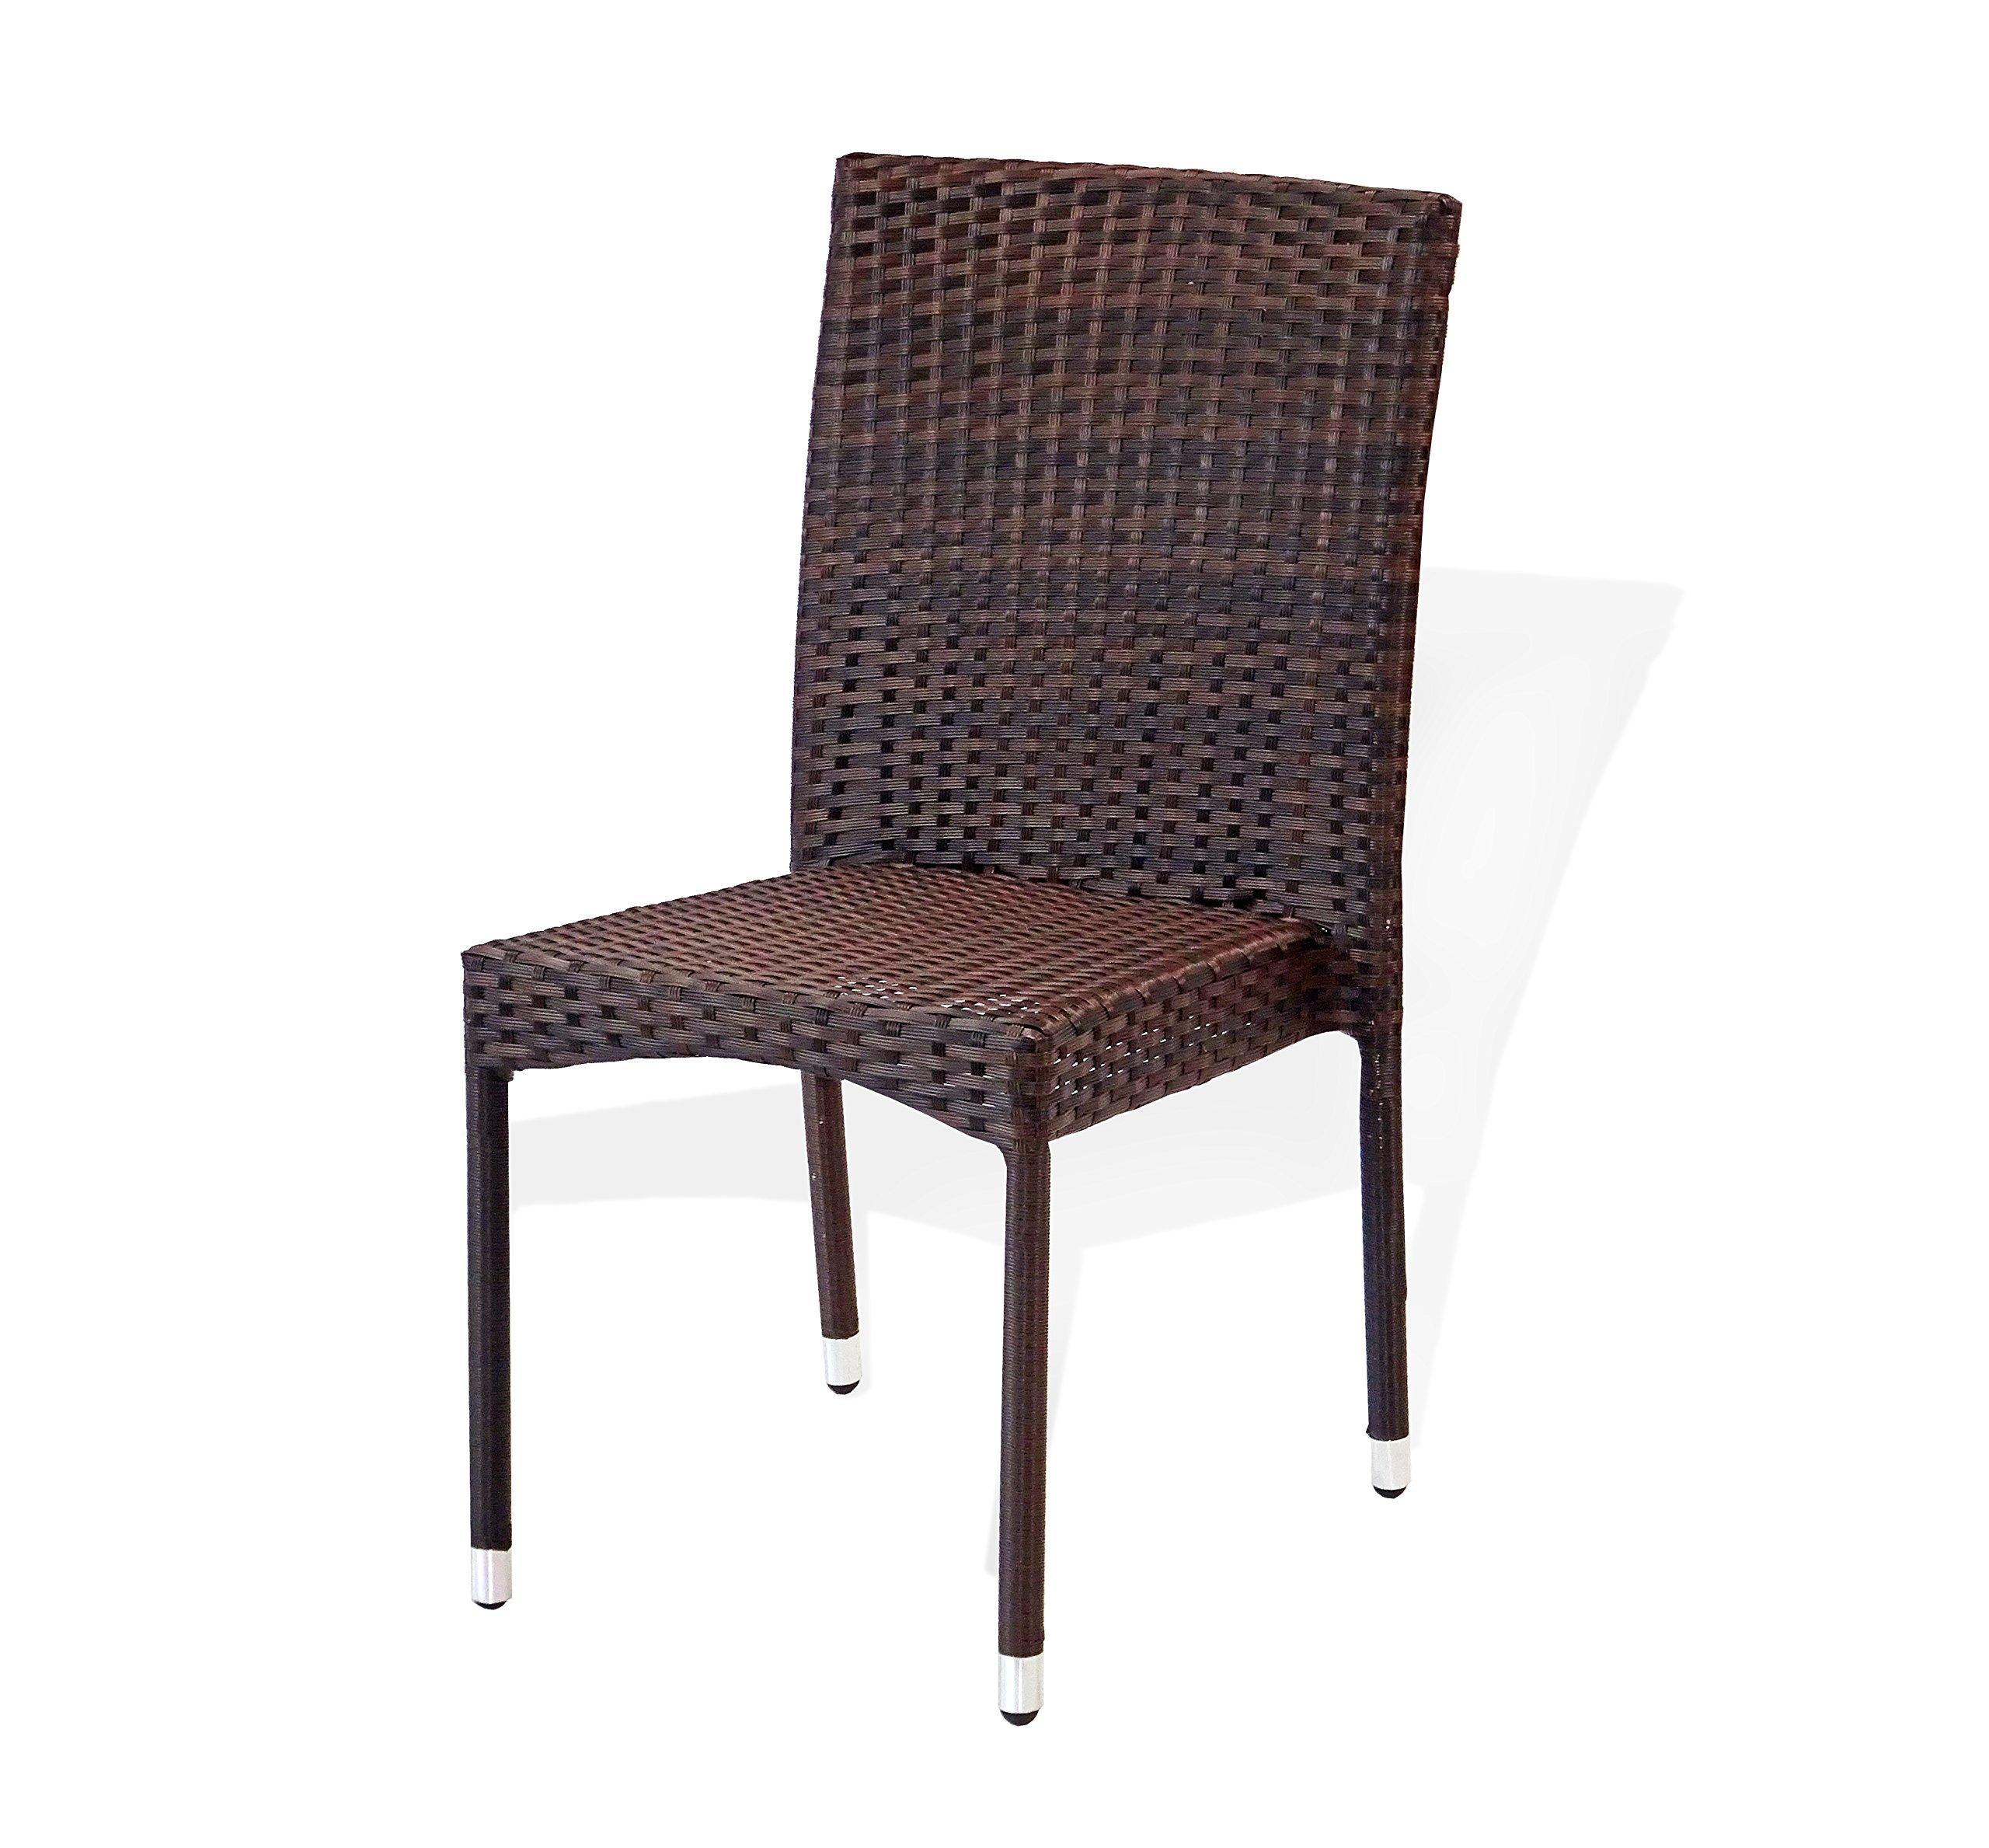 Patio Resin Outdoor Wicker Side Chair. Garden, Sunroom, Deck, Balcony Furniture. Dark Brown Color